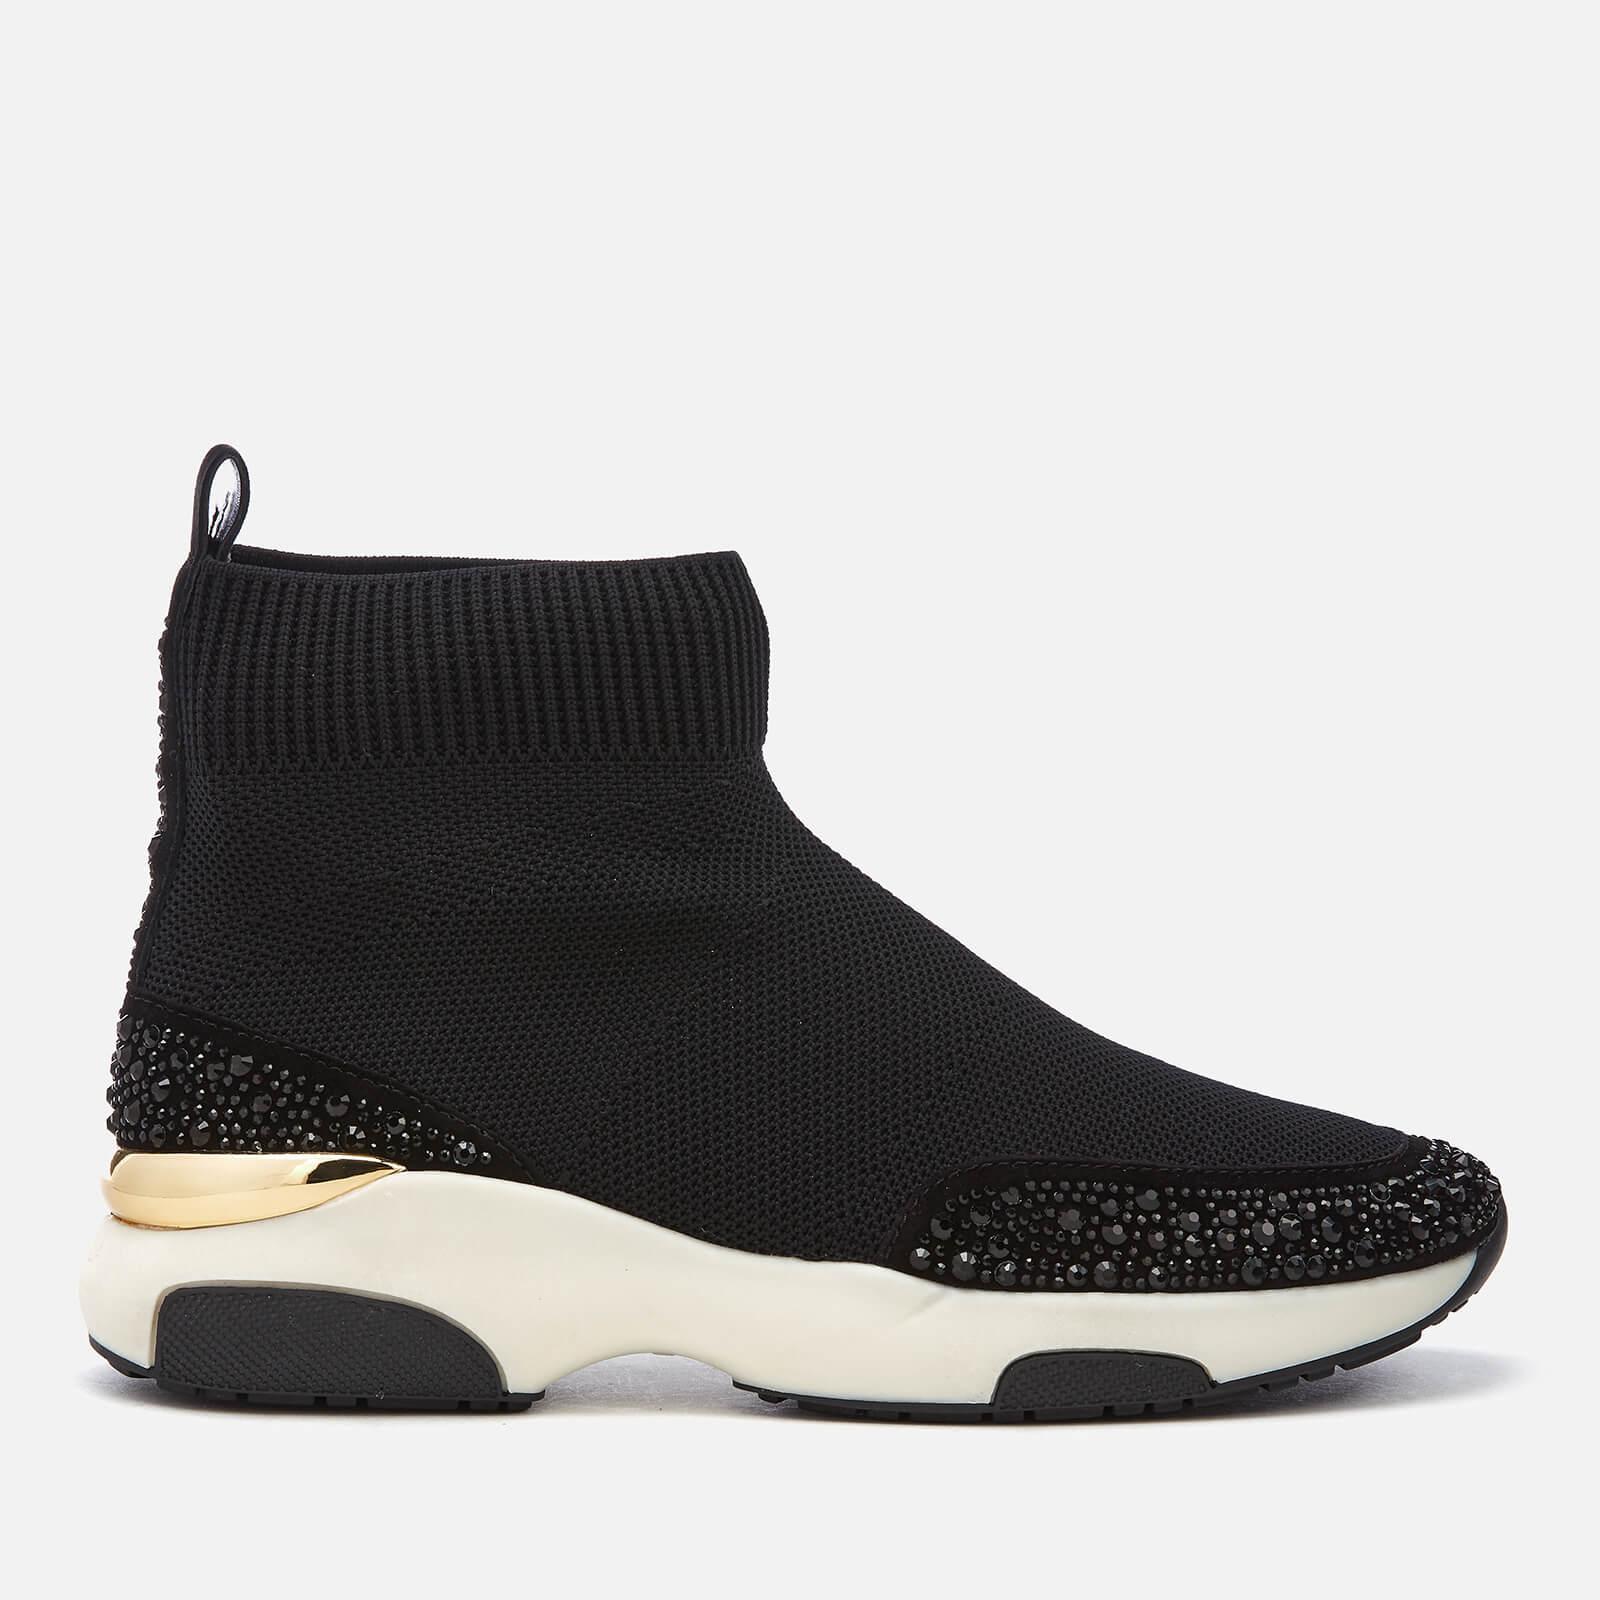 0c23475dafc Carvela Women s Link Sock Trainers - Black Womens Footwear